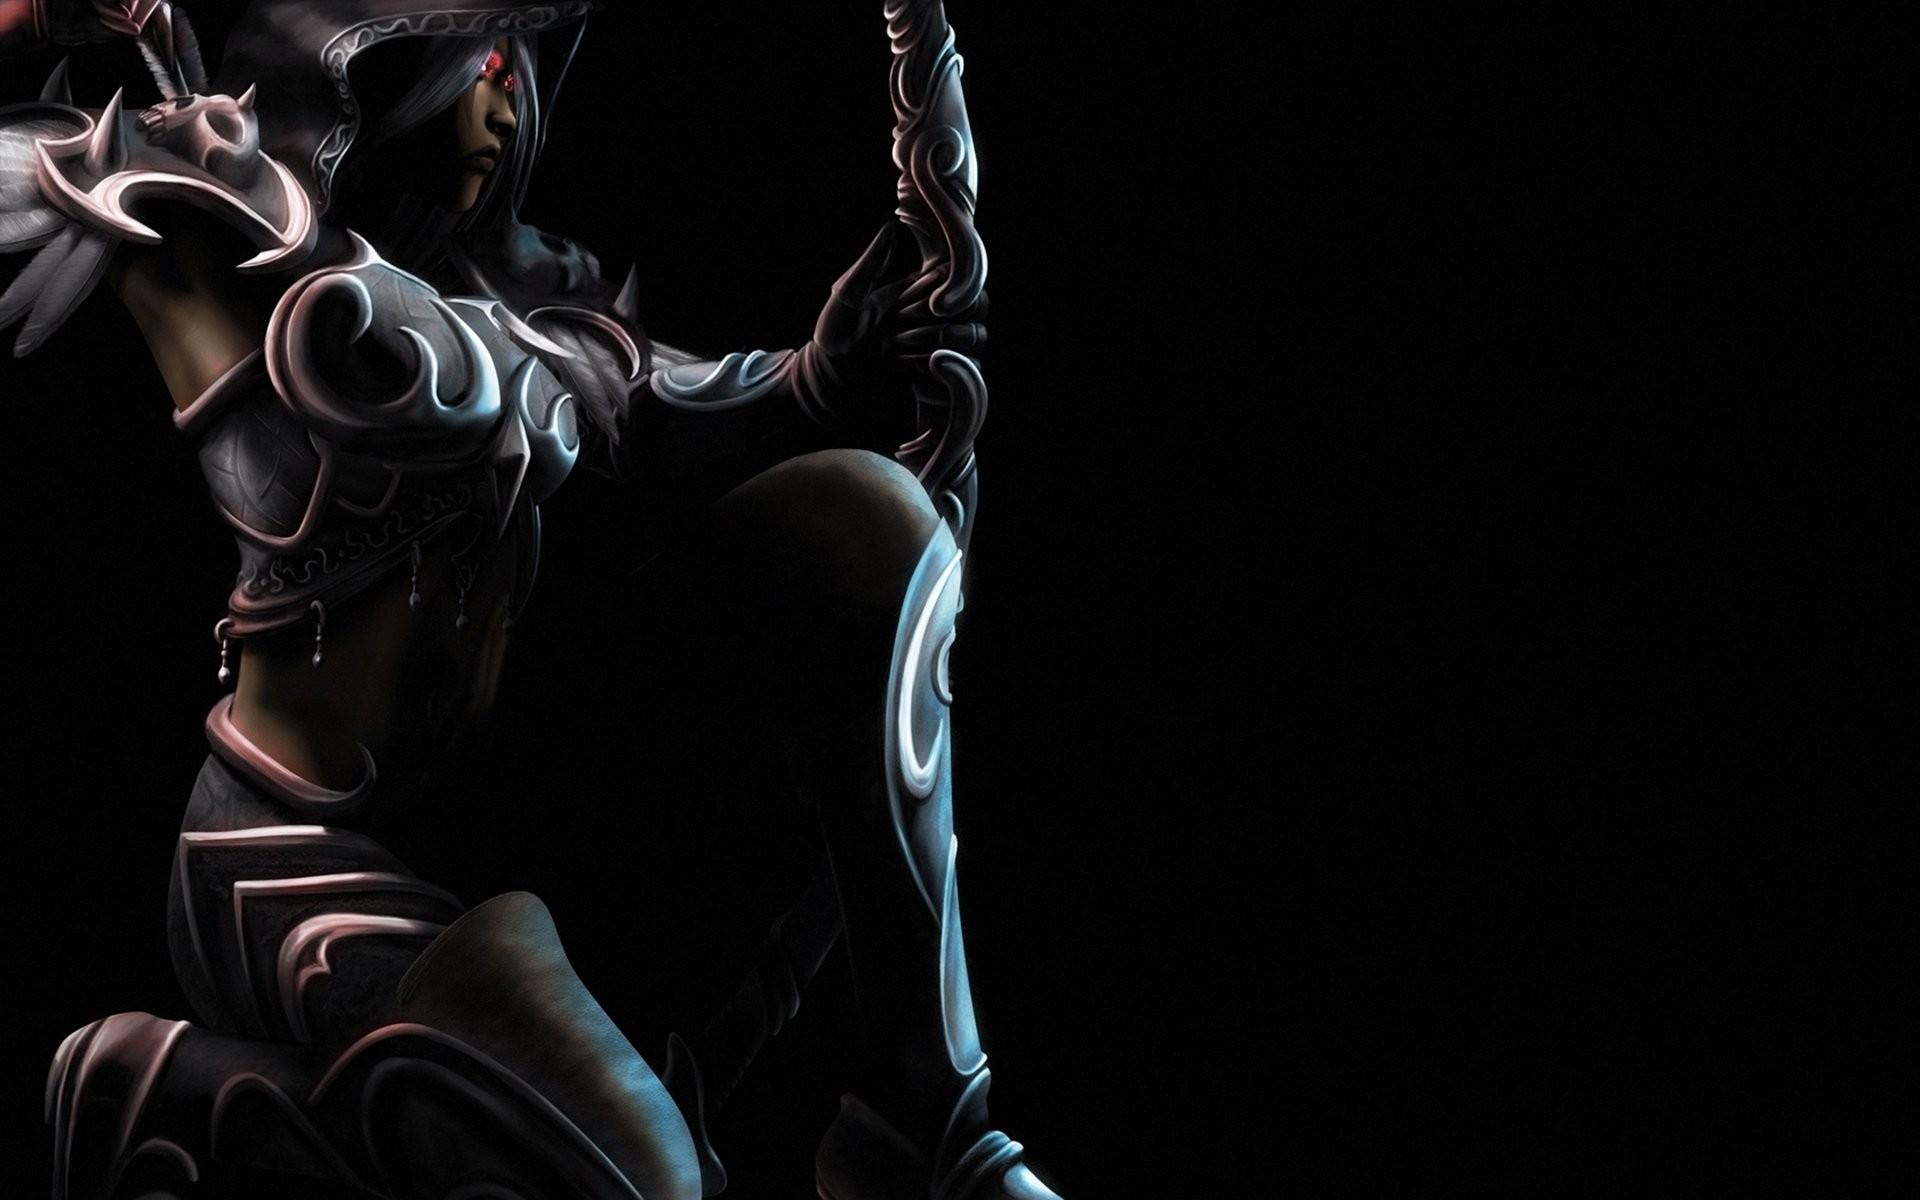 Fantasy – Archer Sylvanas Windrunner Beautiful Armor Dark Woman Warrior CGI  Fantasy Wallpaper